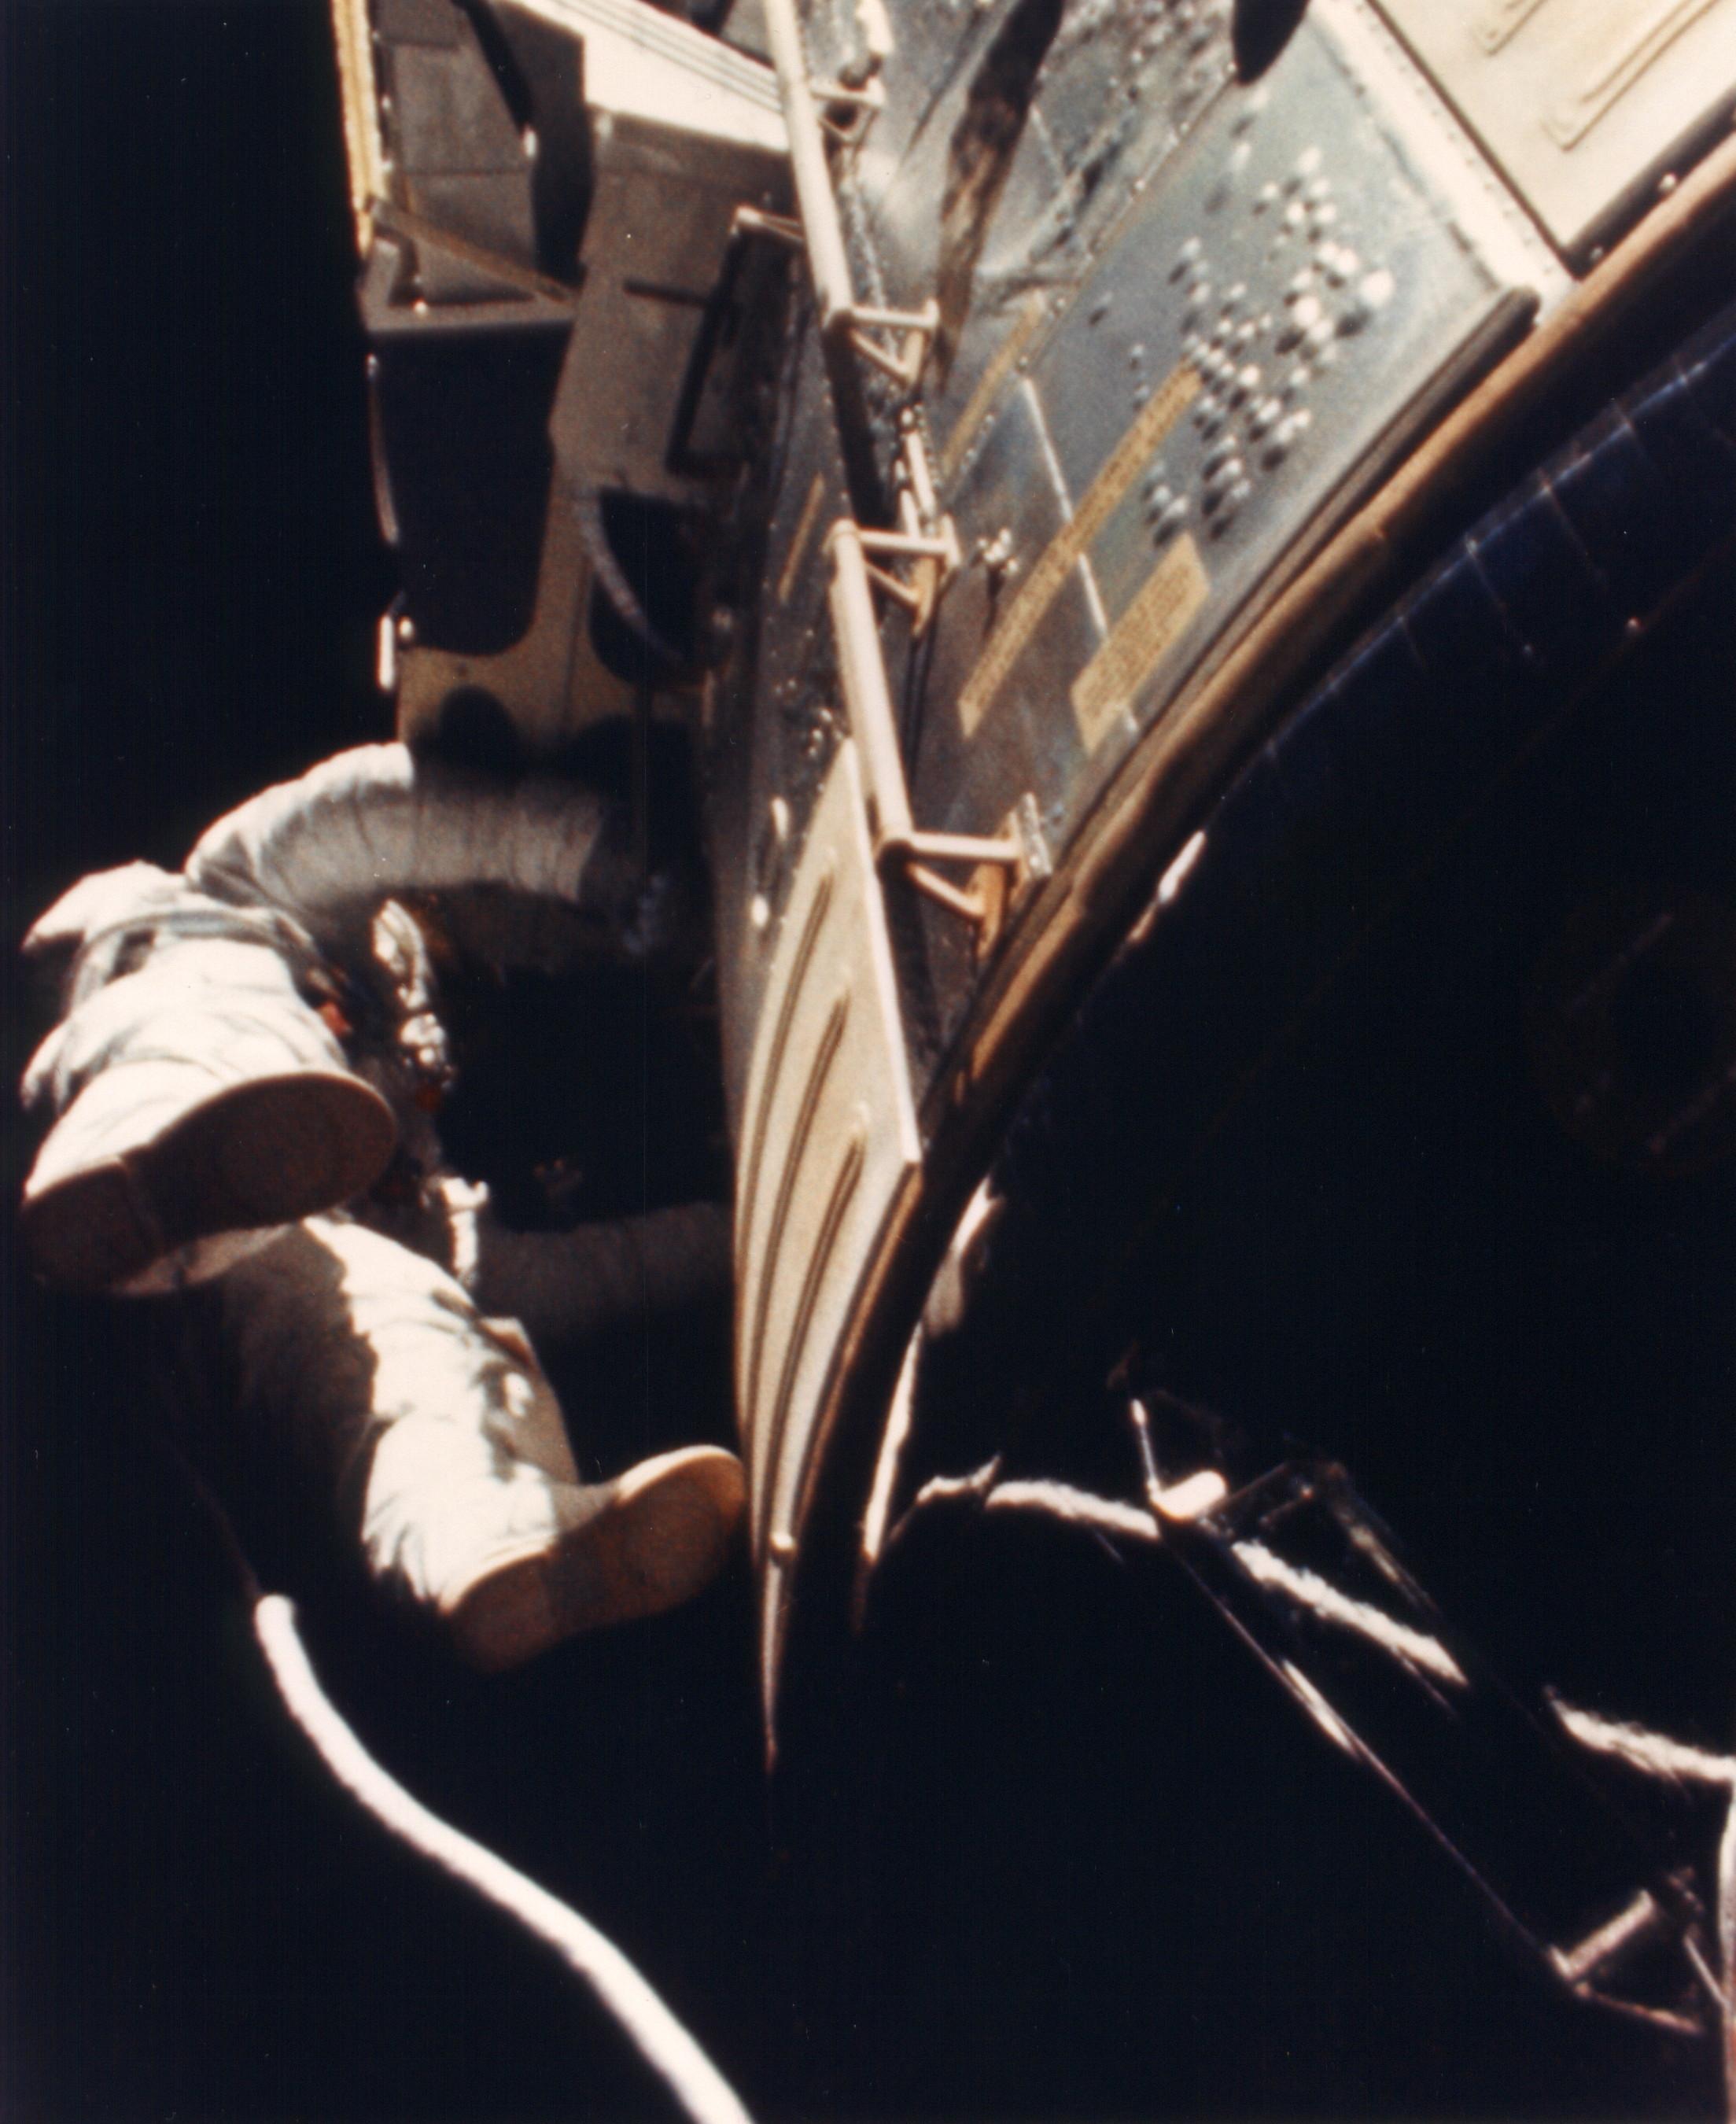 ap15-S71-43202HR.jpg